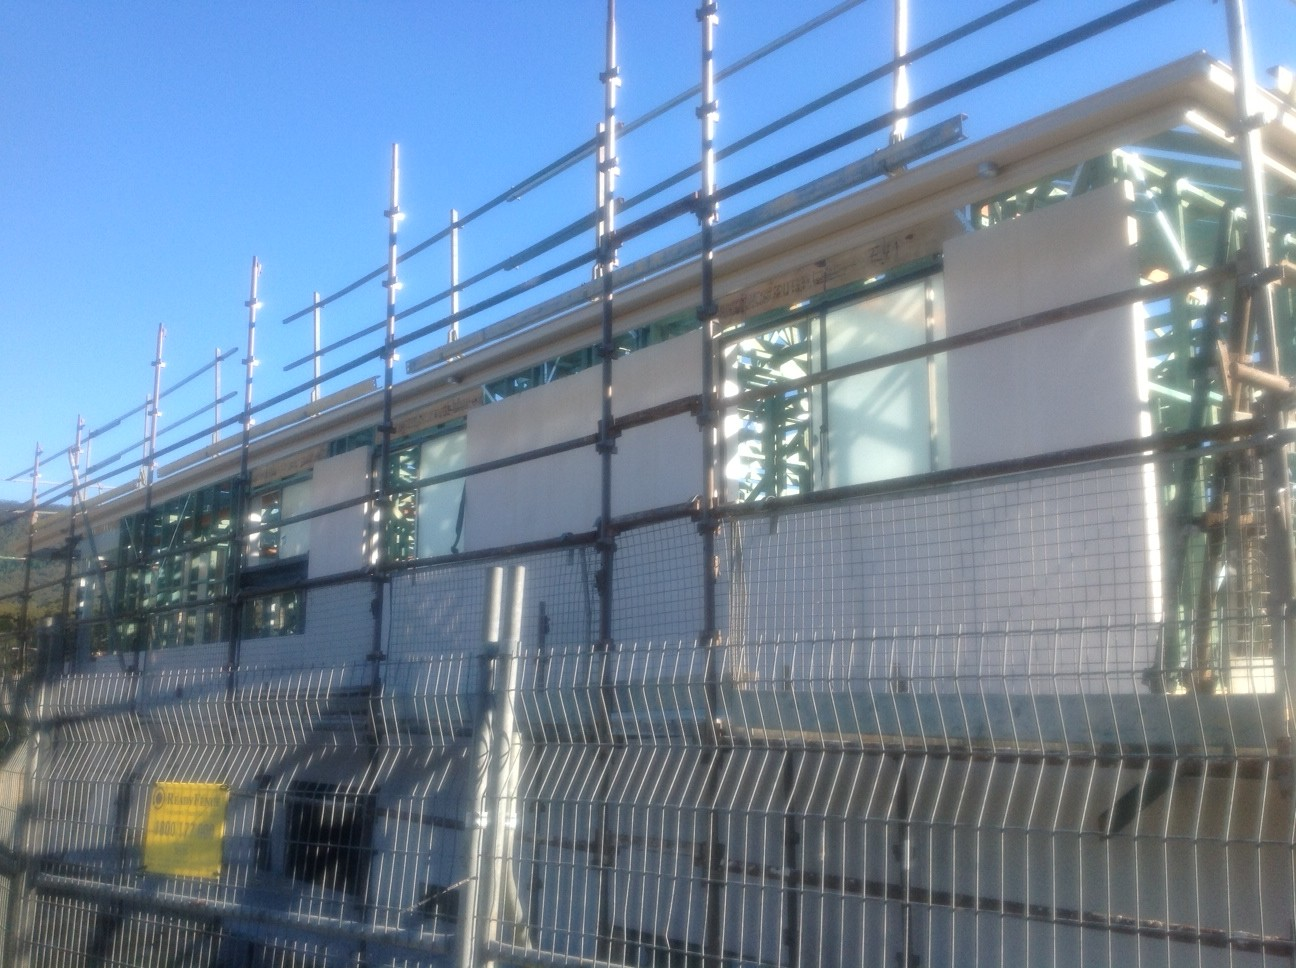 V Amp V S Metricon Phoenix Brooksreach Horsley Windows